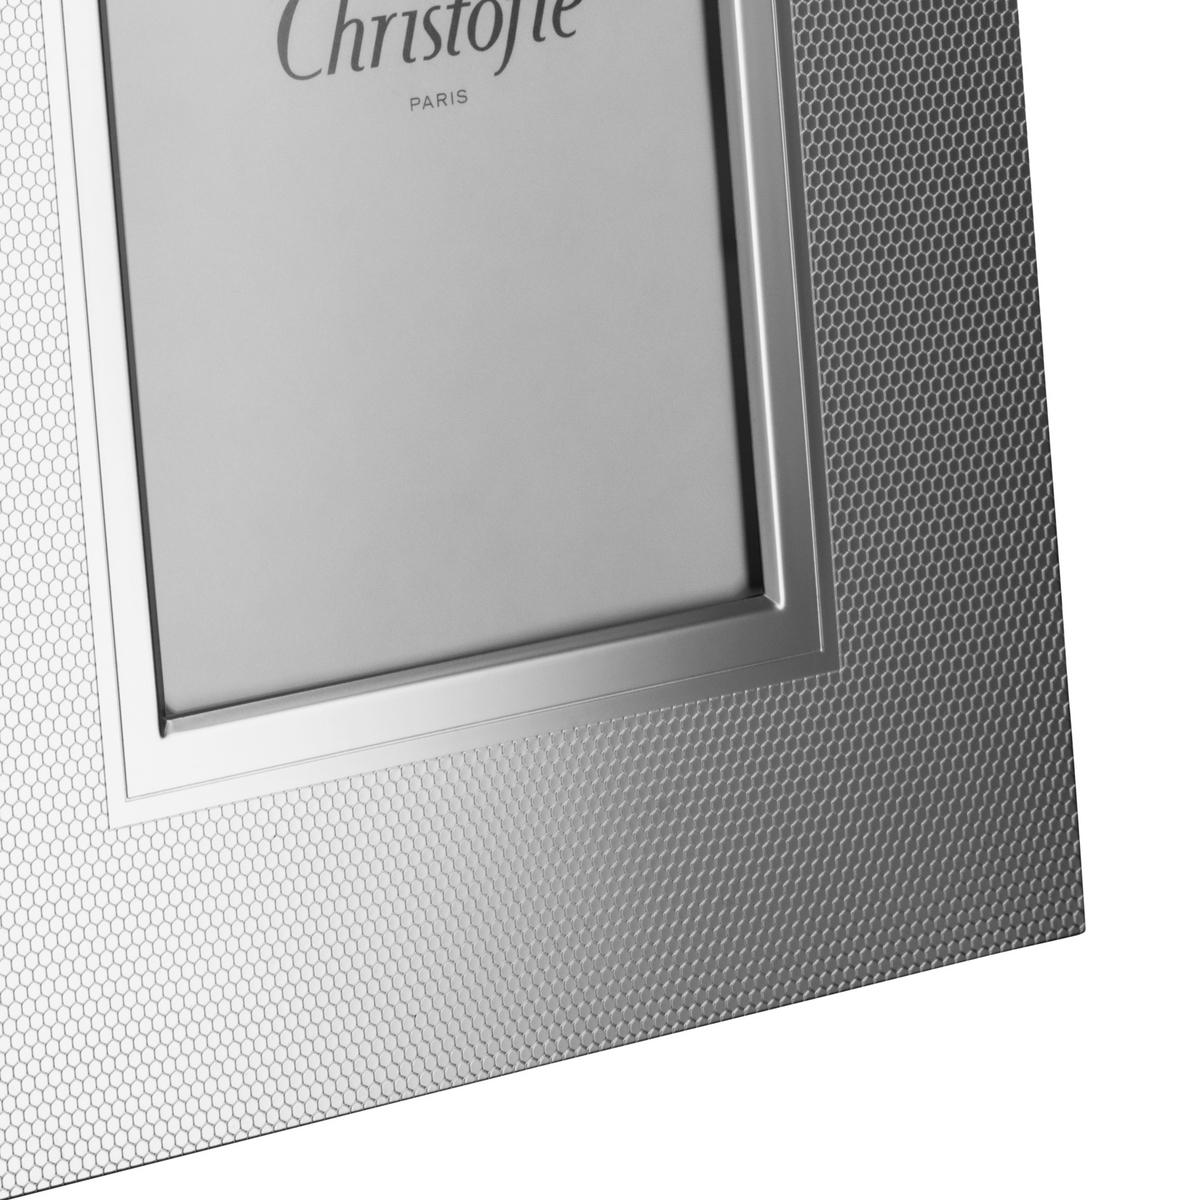 Christofle Bilderrahmen Madison 6, versilbert | Artedona.com